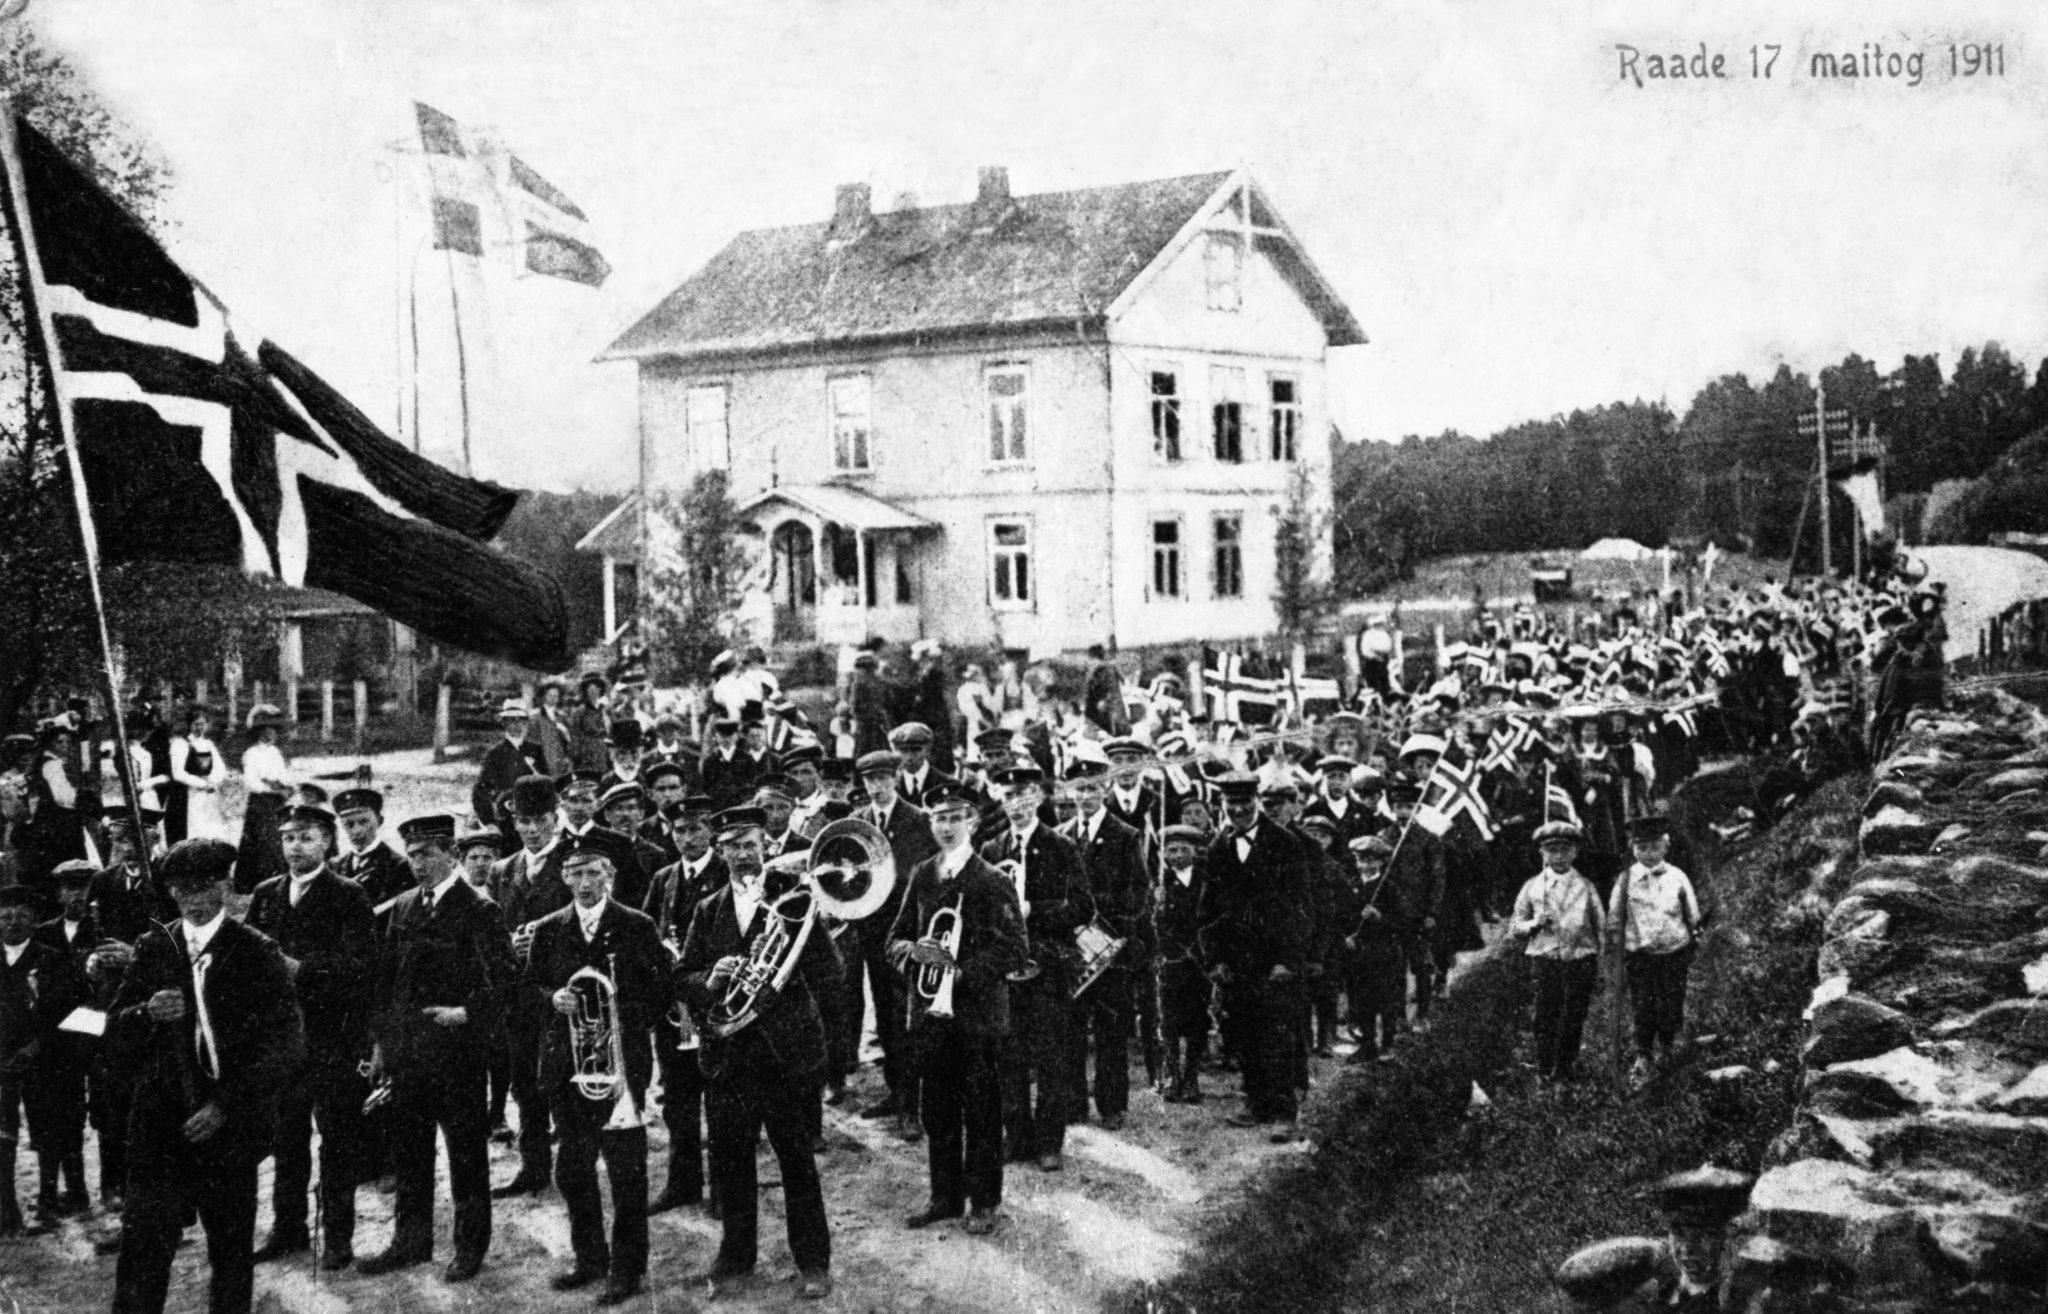 17. maifeiring ved det gamle herredshuset i Råde 1911. Fotograf ukjent / Østfold fylkes billedarkiv. ØFB.1979-00202